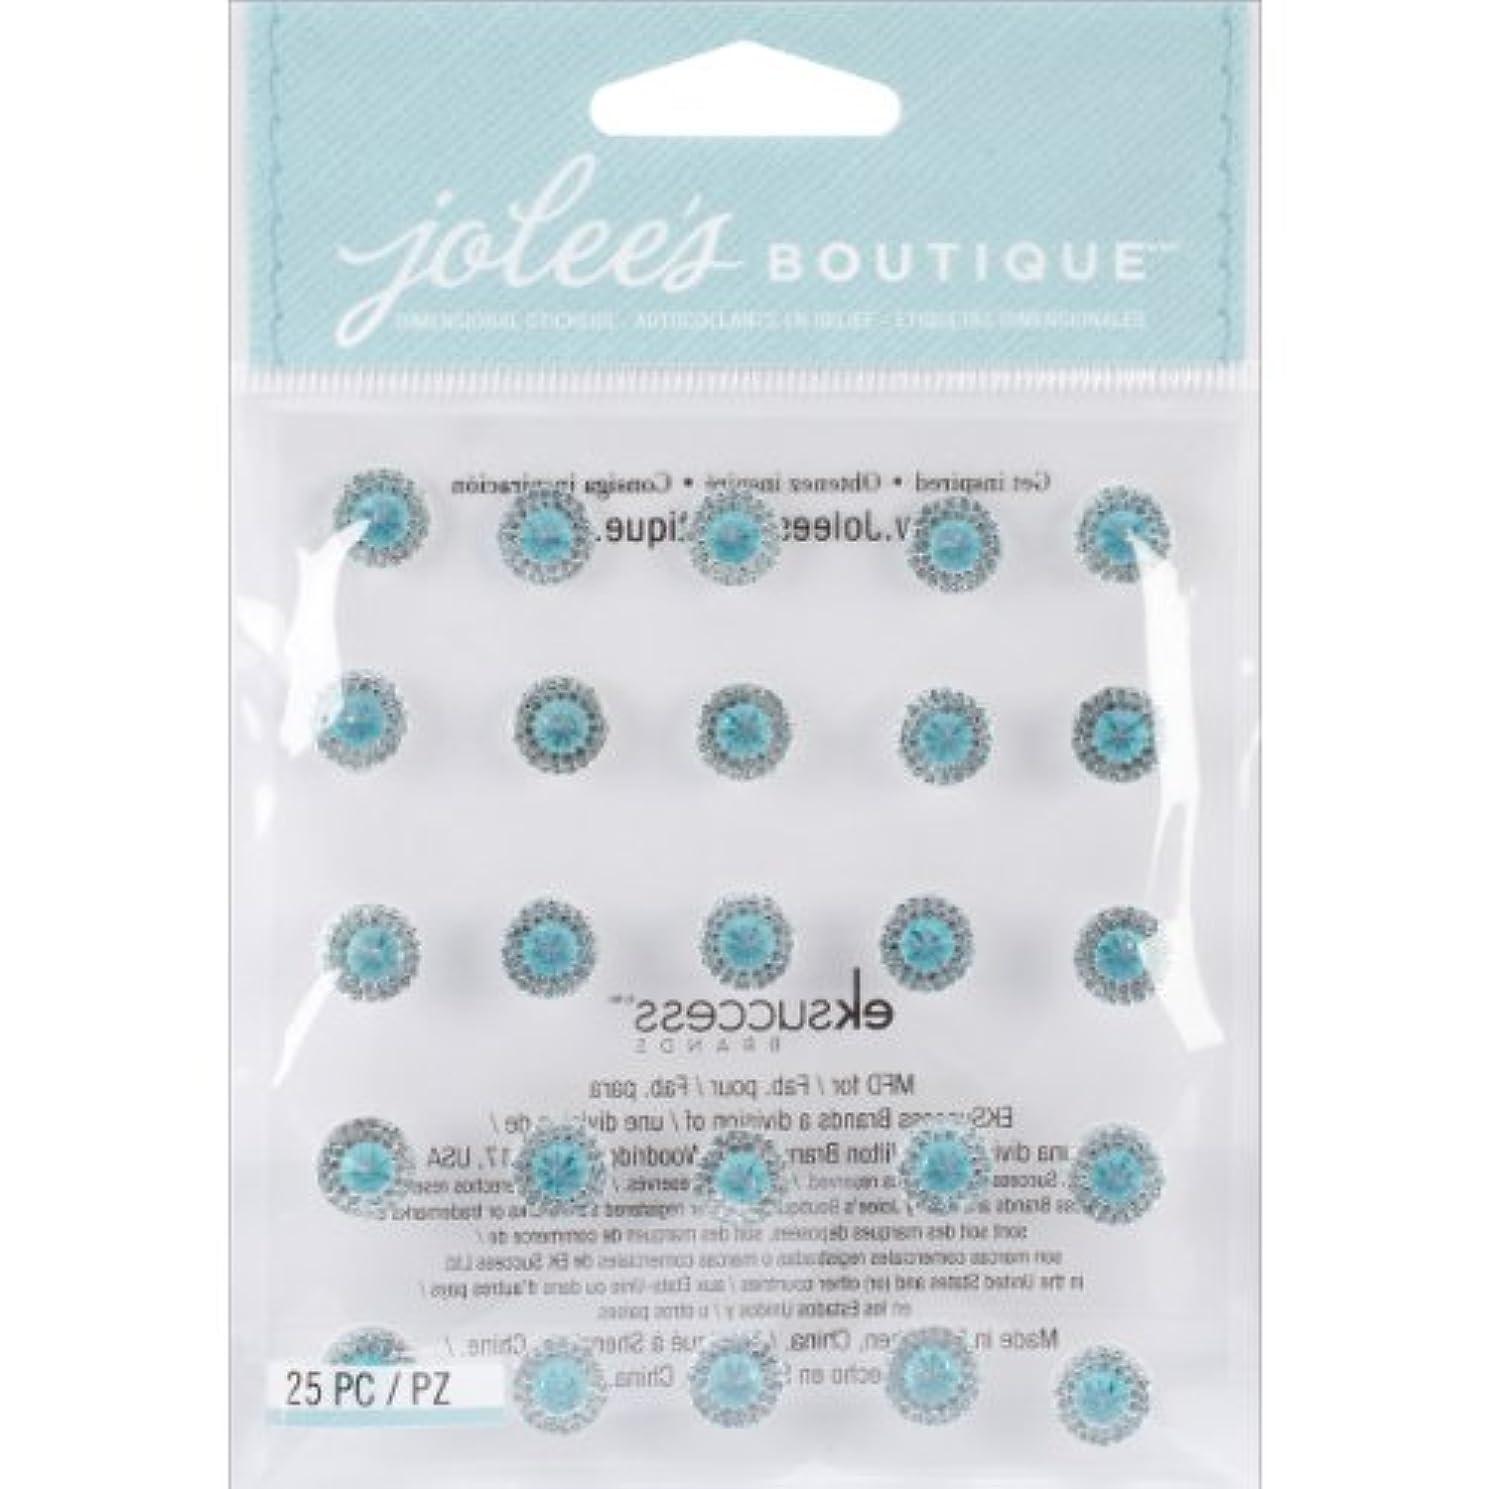 Jolee's Boutique Dimensional Bling Stickers, Dual Tone Prism Aquamarine